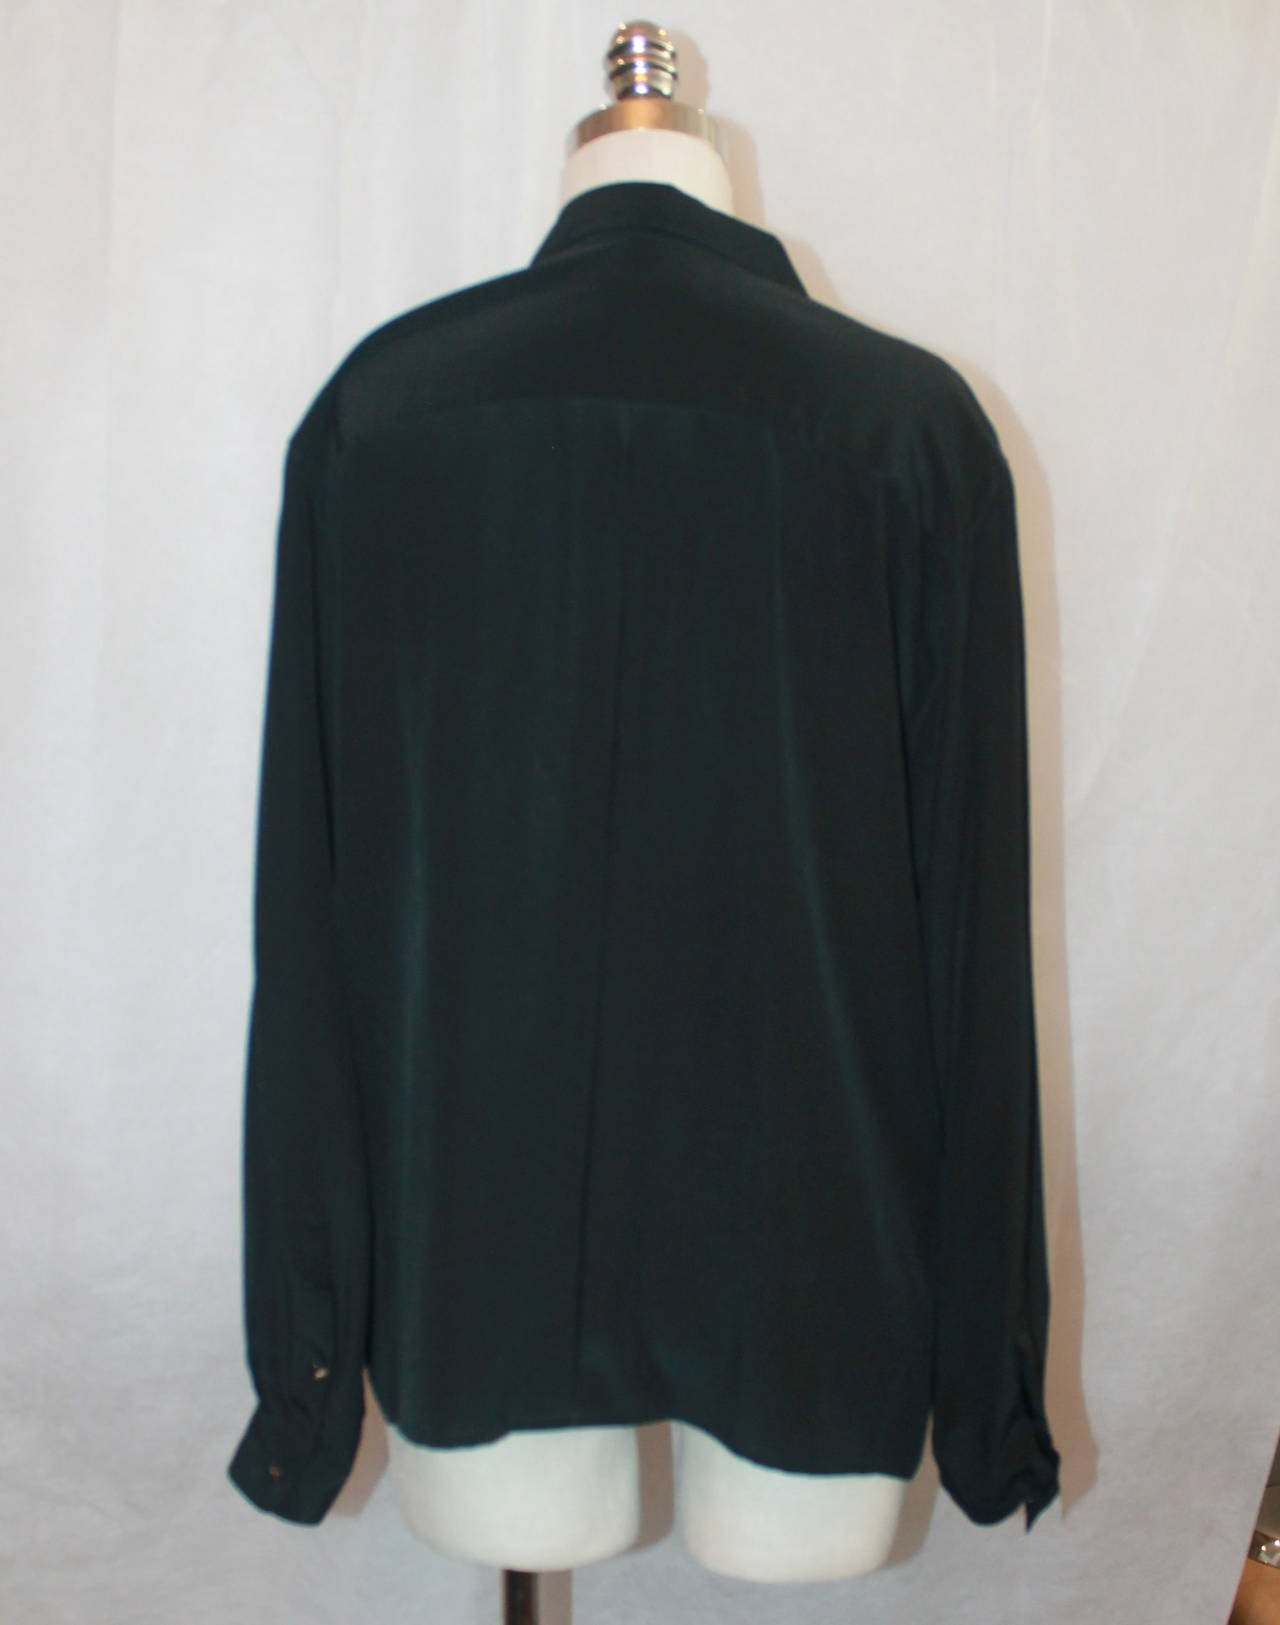 Chanel 1980's Vintage Black Silk Chiffon Long Sleeve Blouse - M For Sale 1